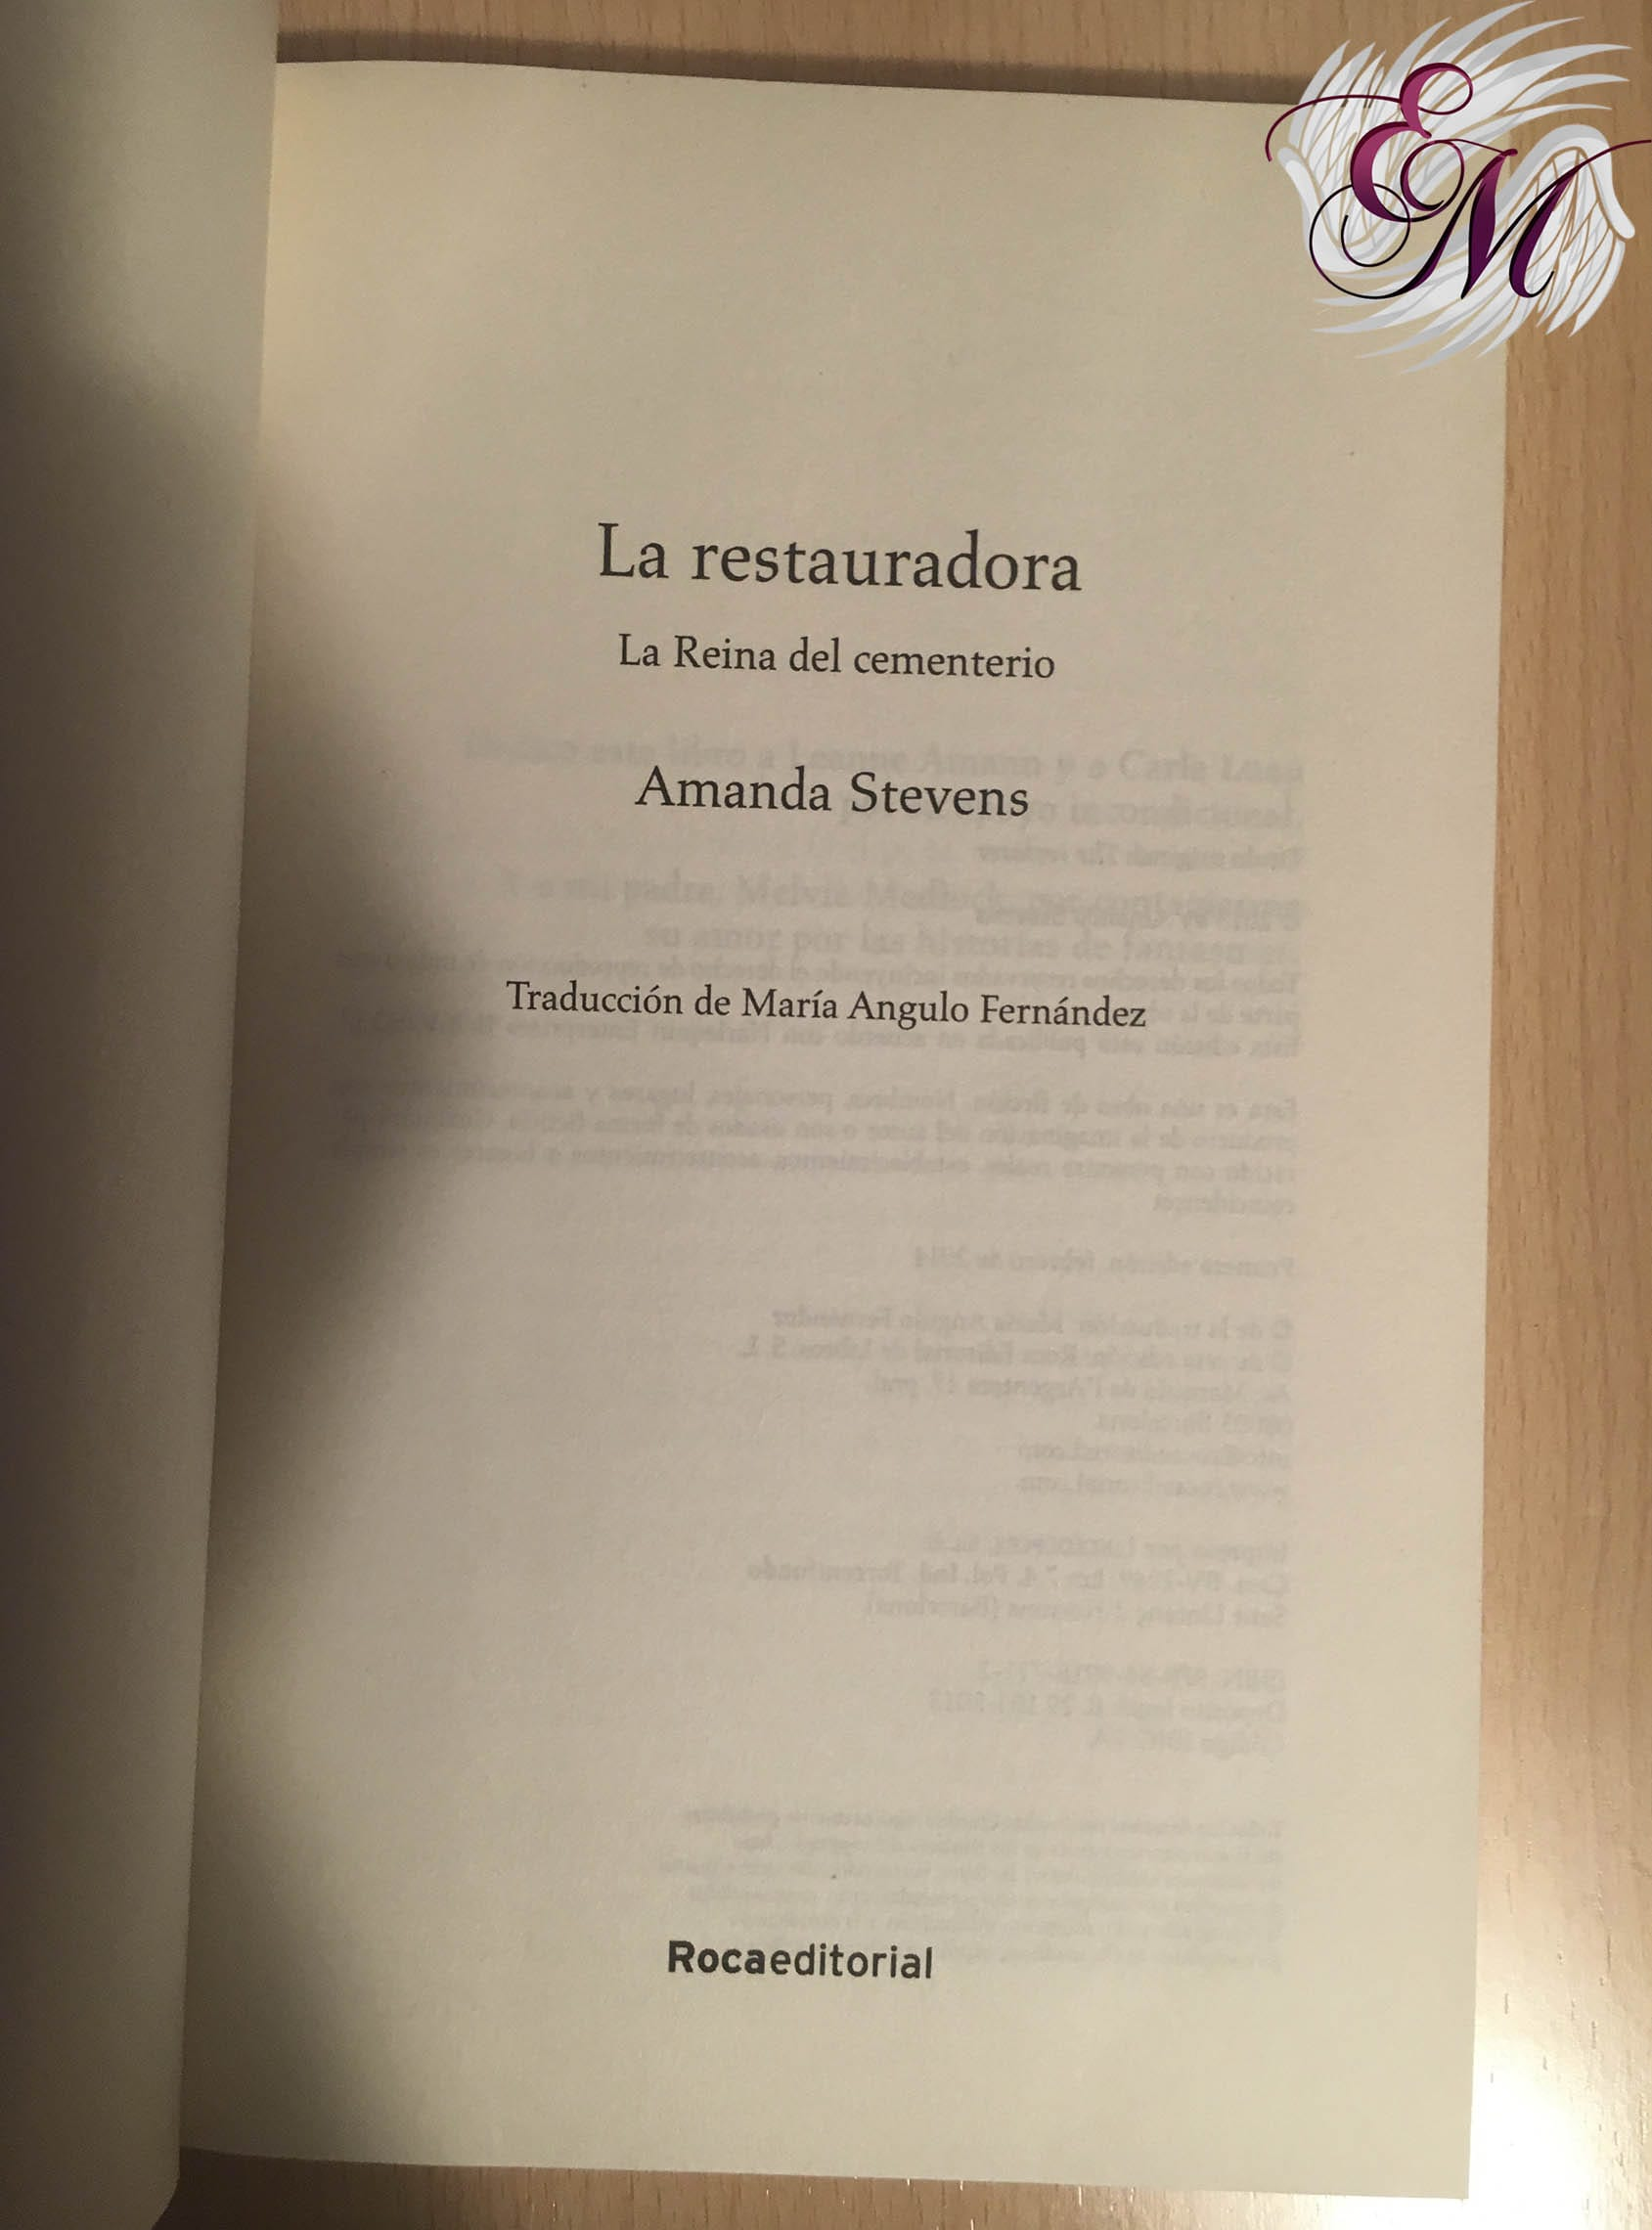 La Restauradora, de Amanda Stevens - Reseña